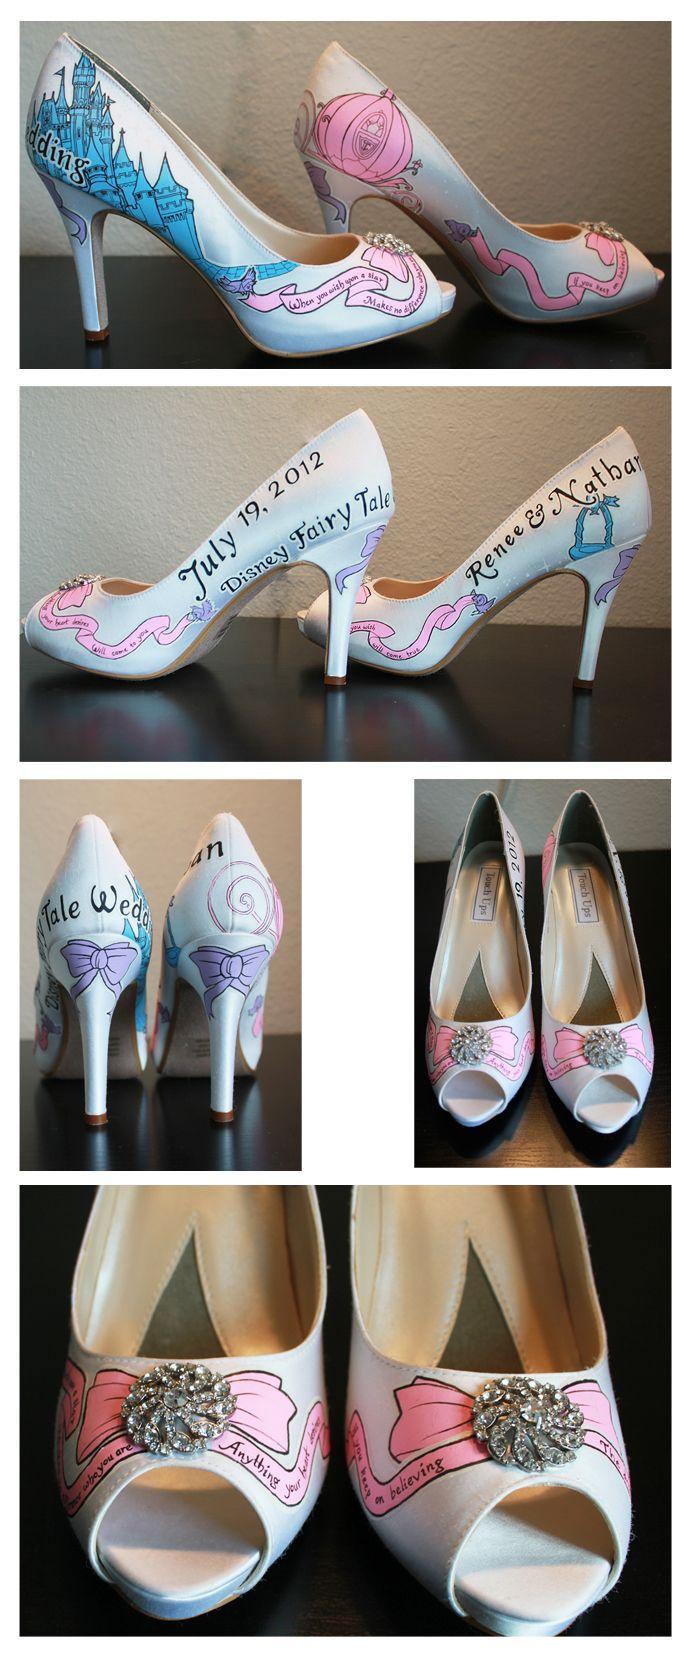 Wedding - Custom Designed Shoes By BeeBee